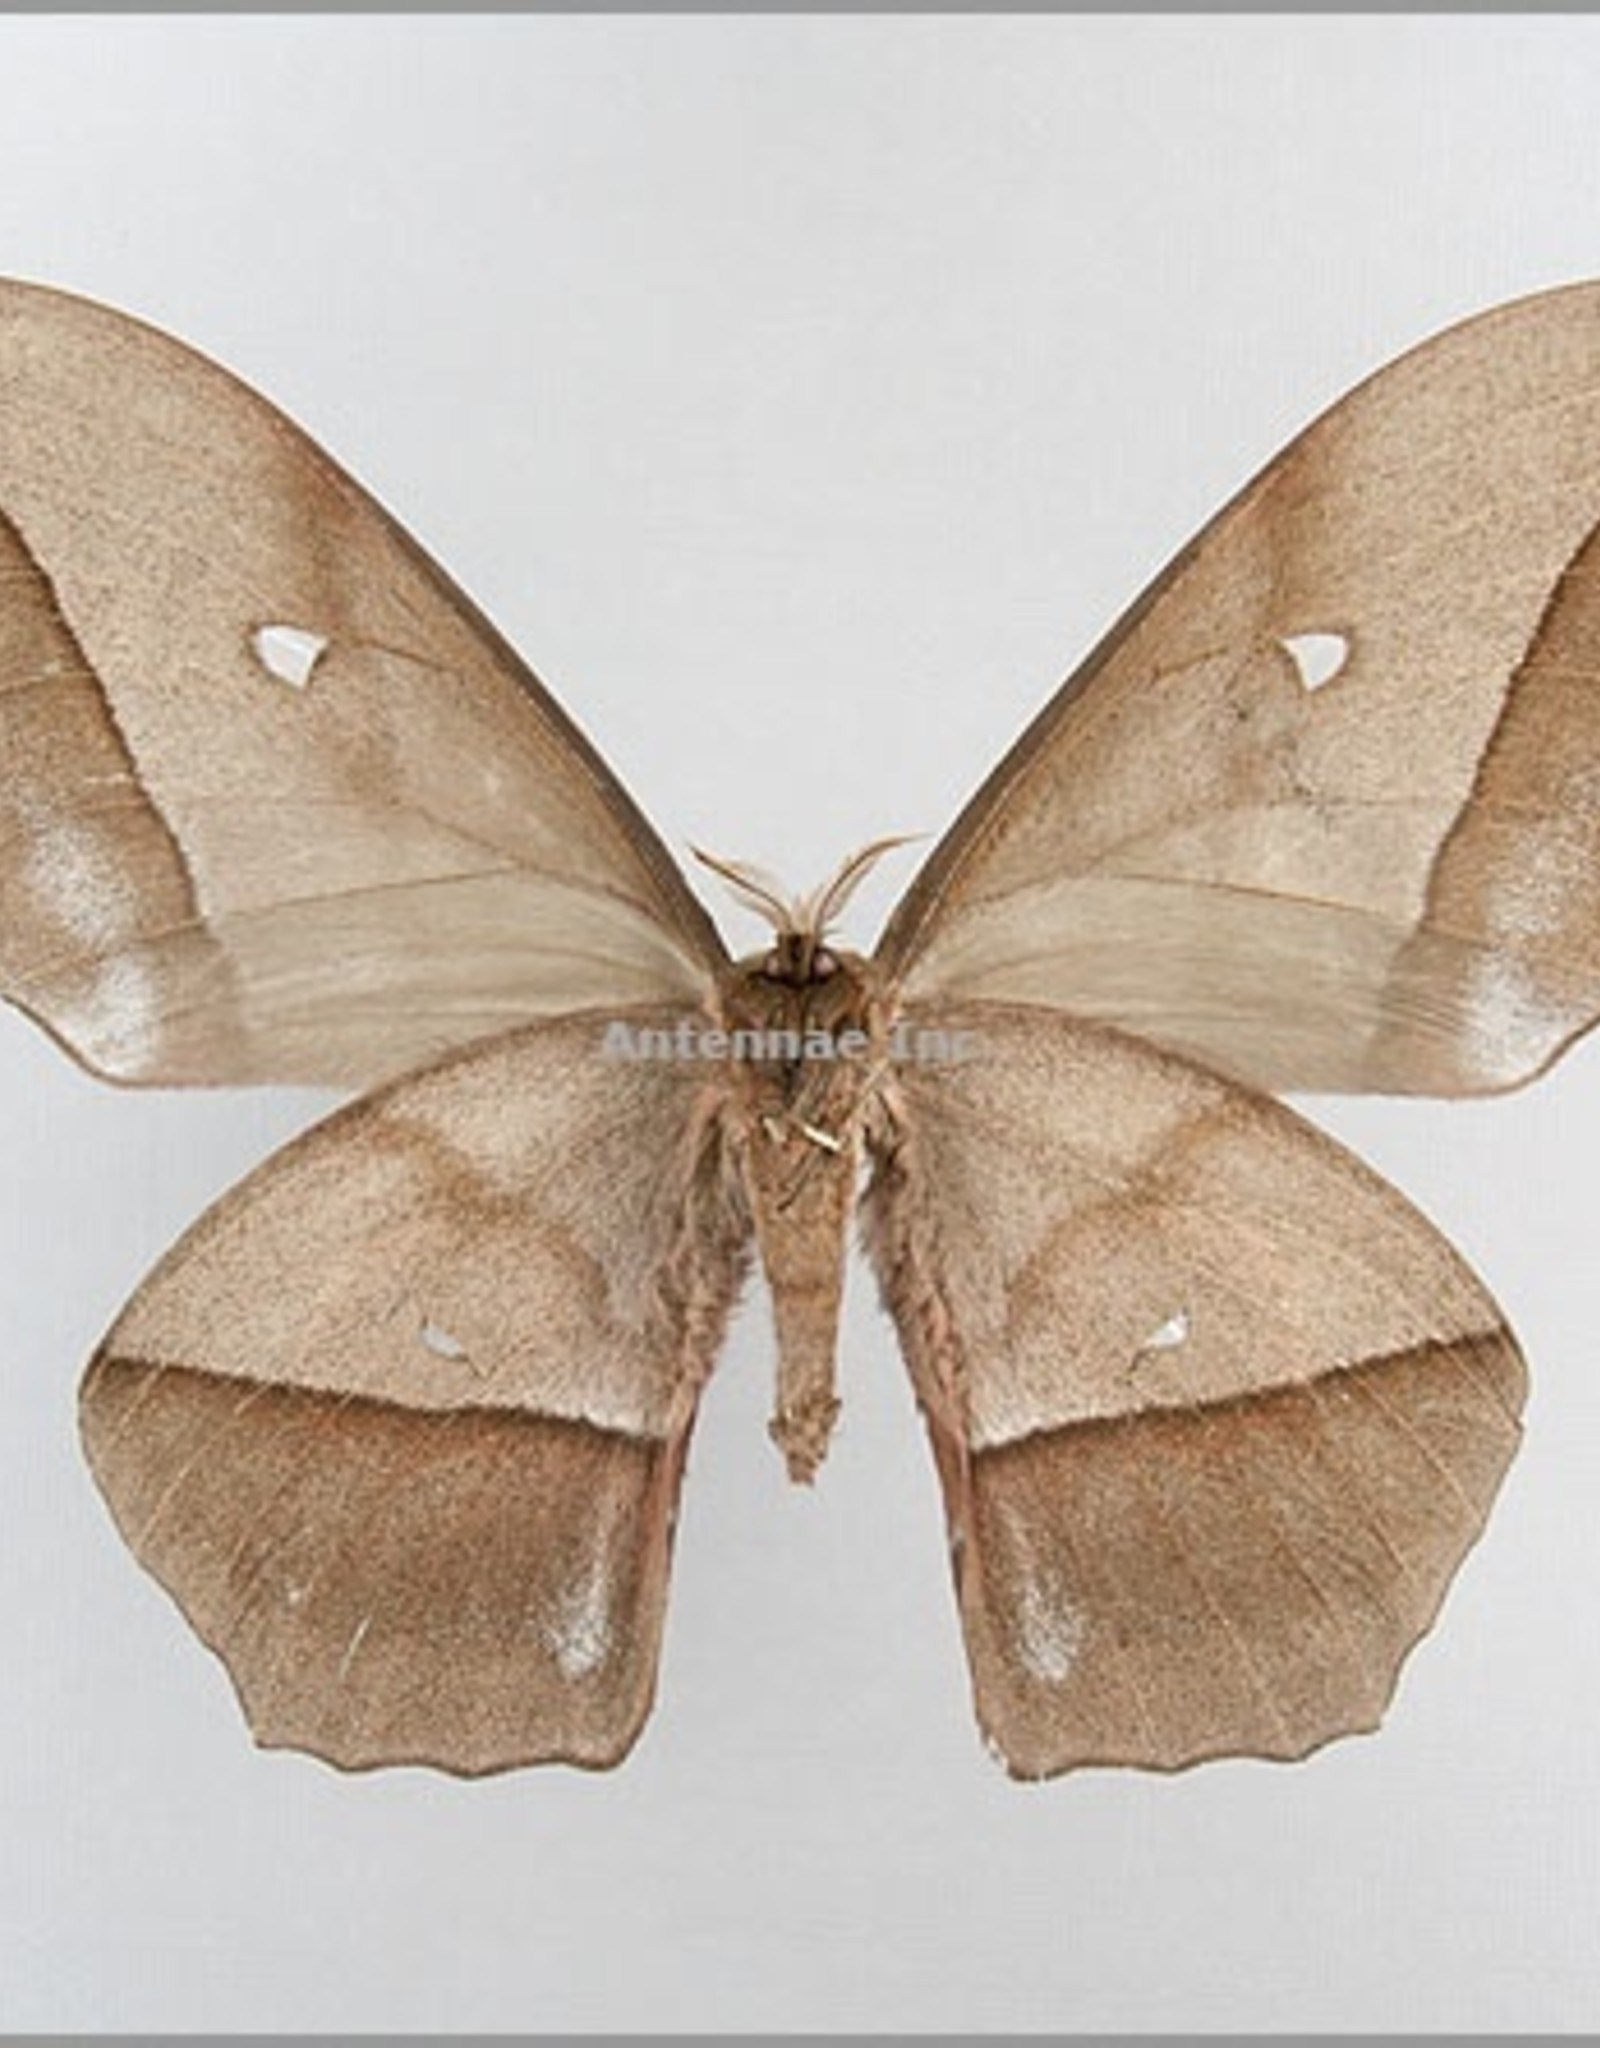 Nudaurelia eblis buchholzi M A1/A1- Cameroon